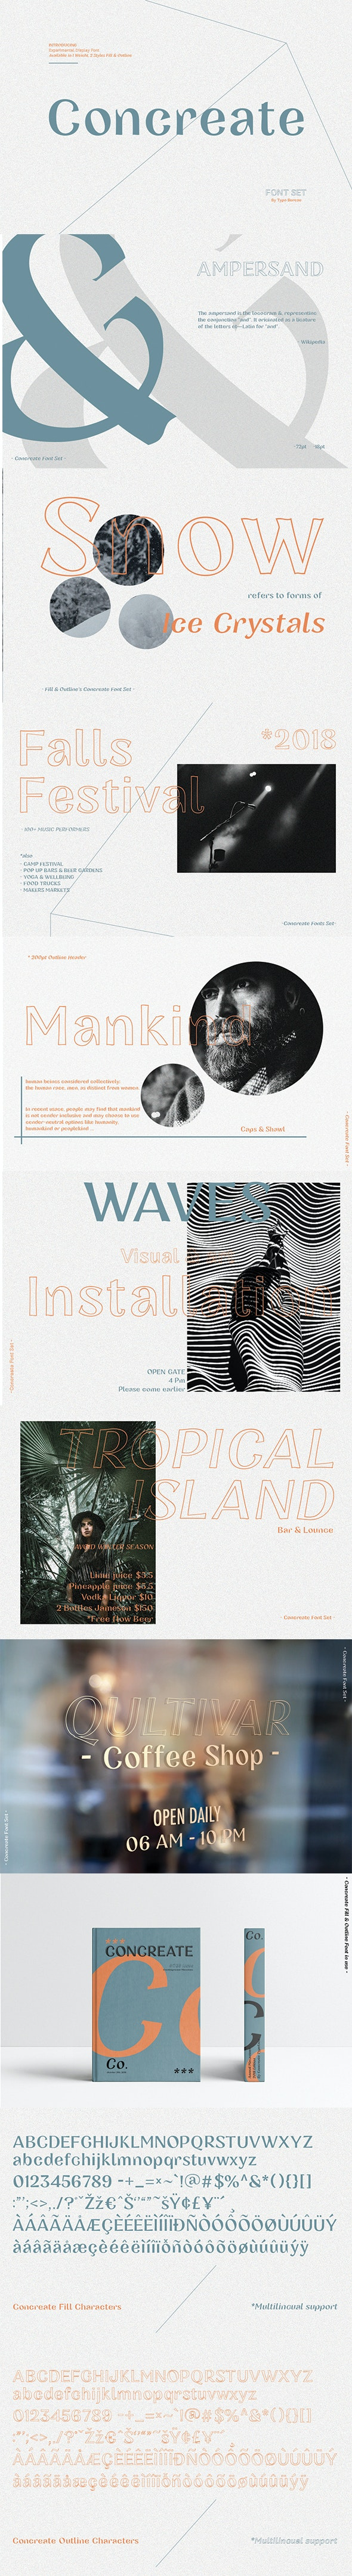 Concreate - display font - Decorative Fonts